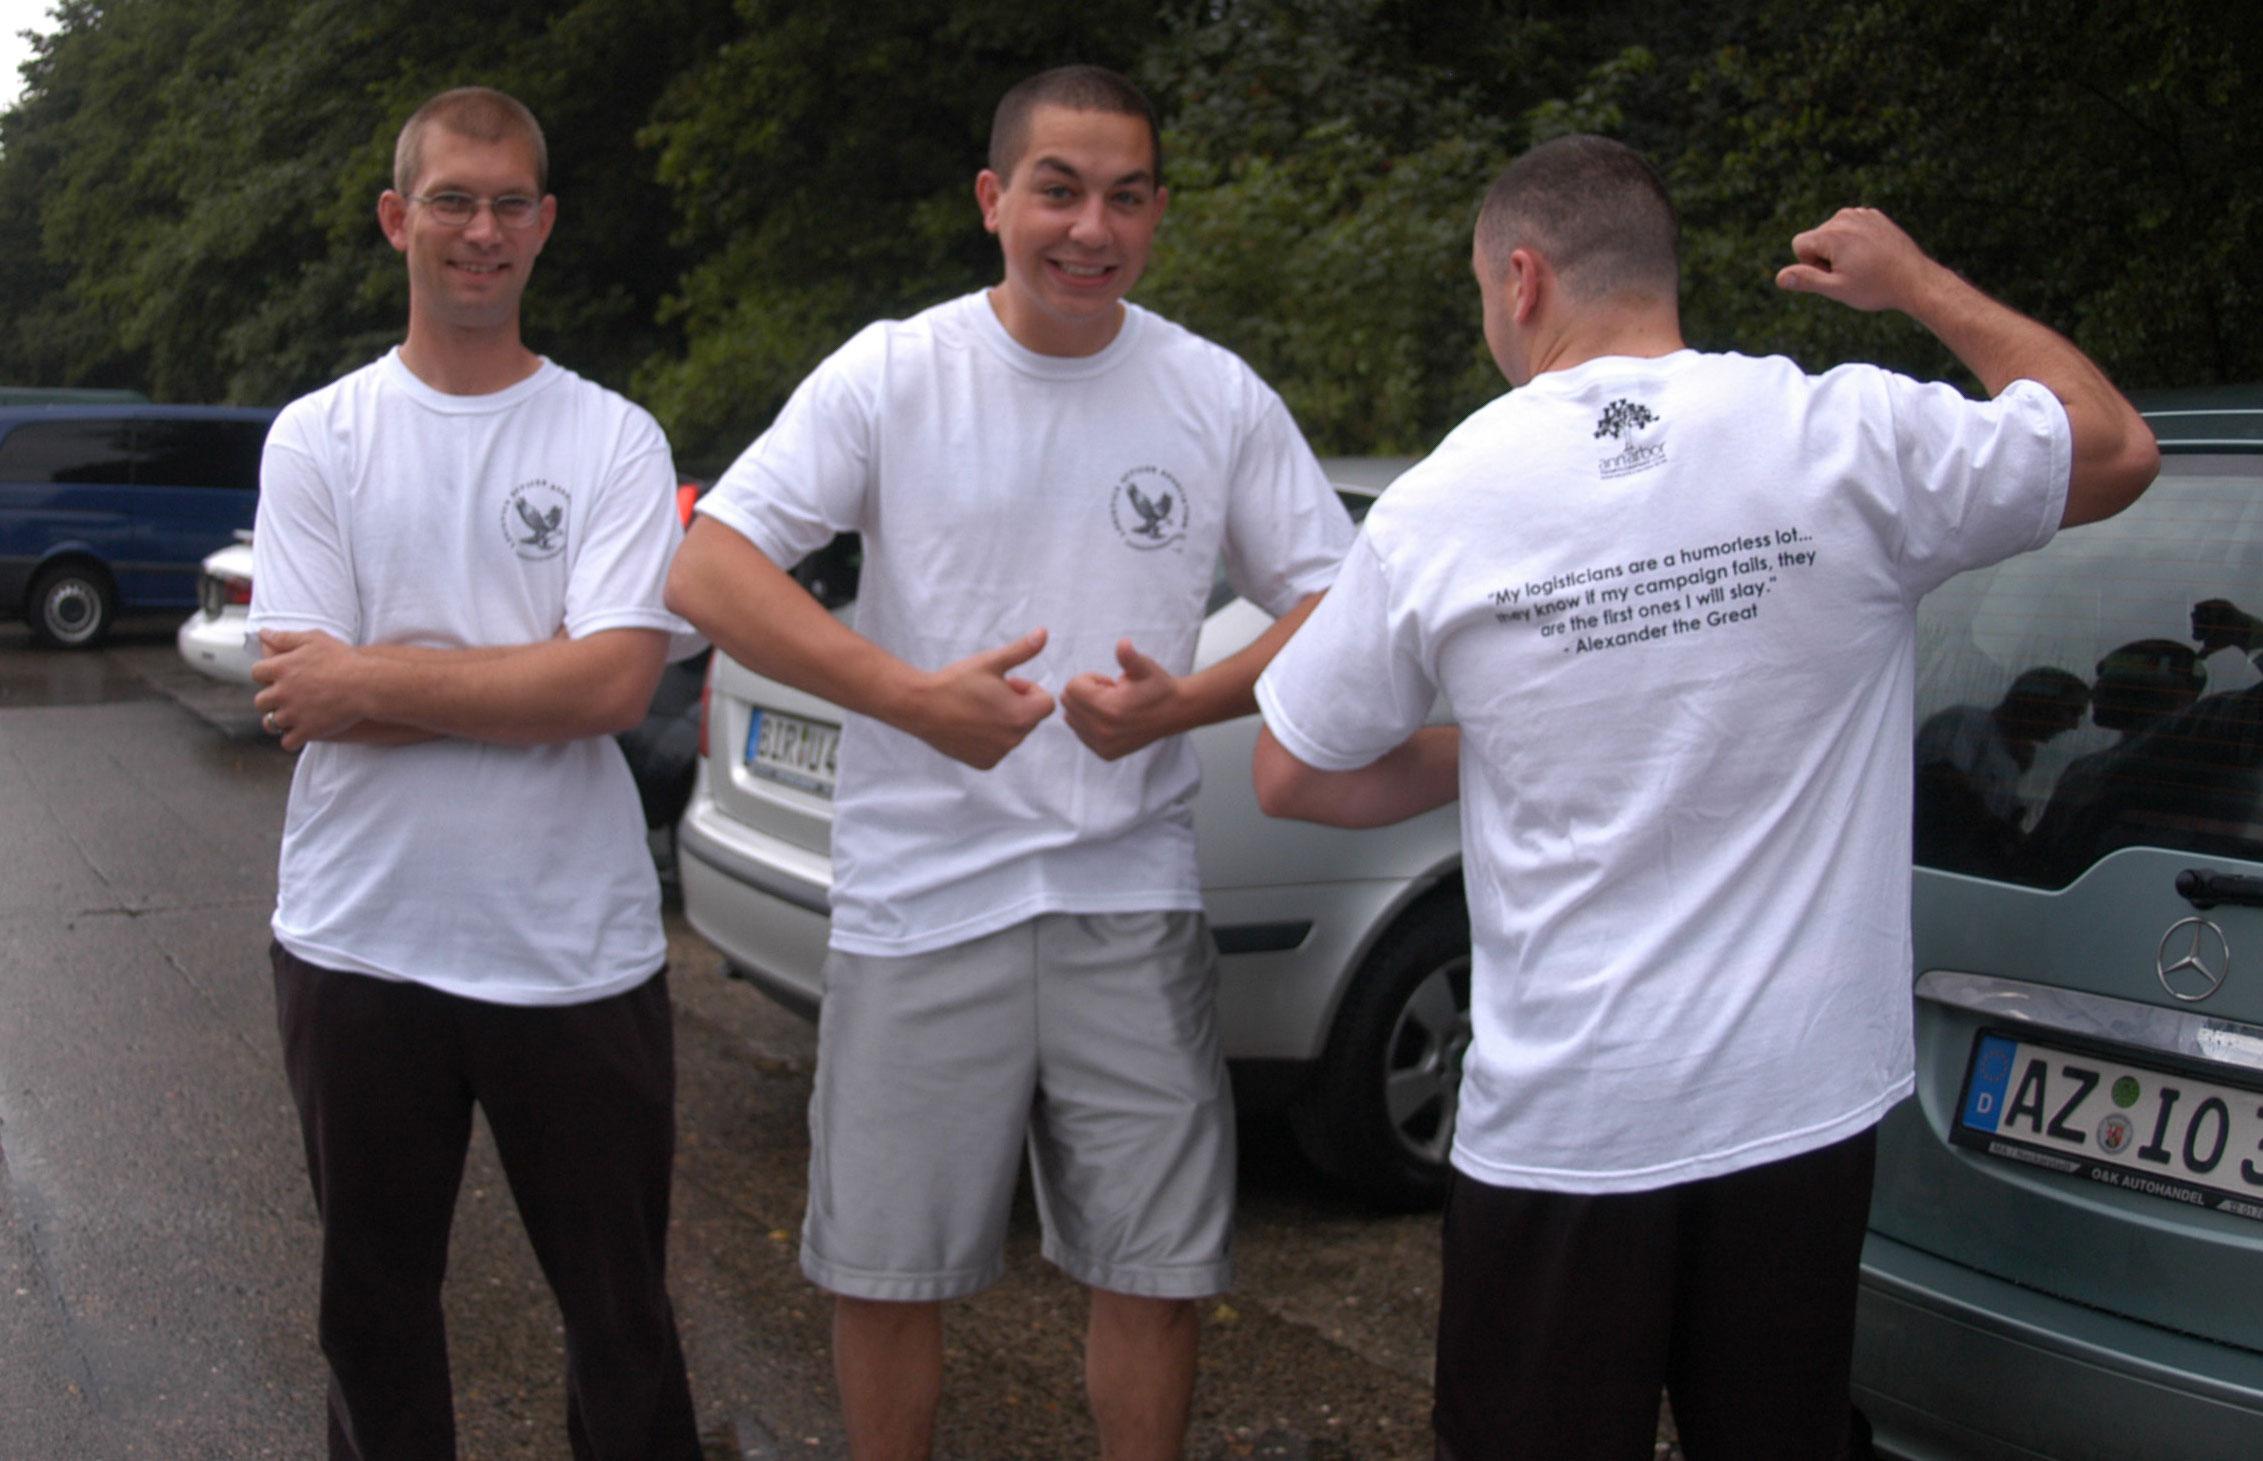 Rammstein Airbase t-shirt